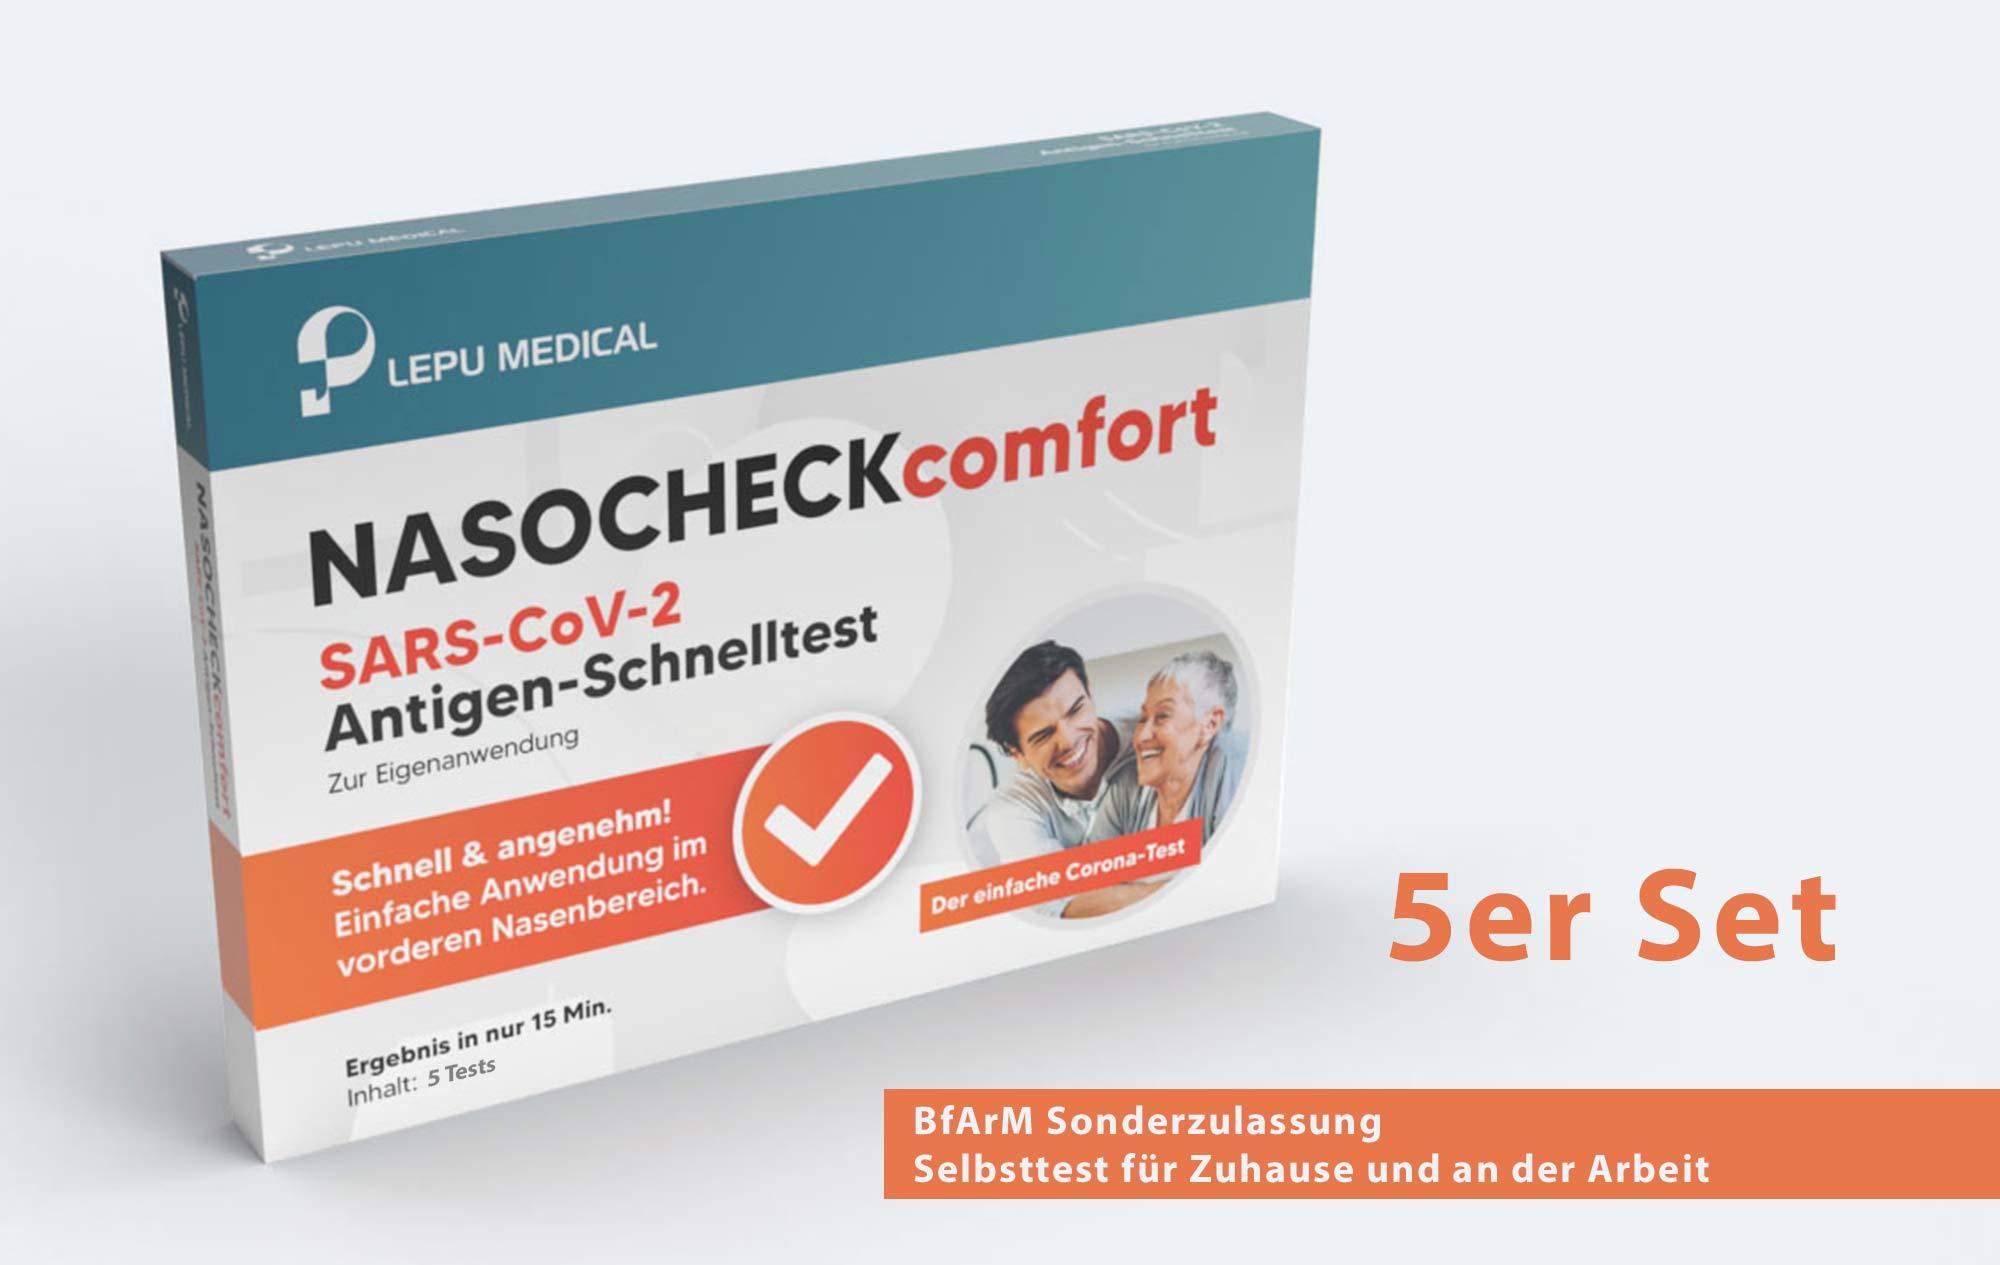 LEPU NASOCHECKcomfort Corona Antigen-Selbsttest, 5er Set